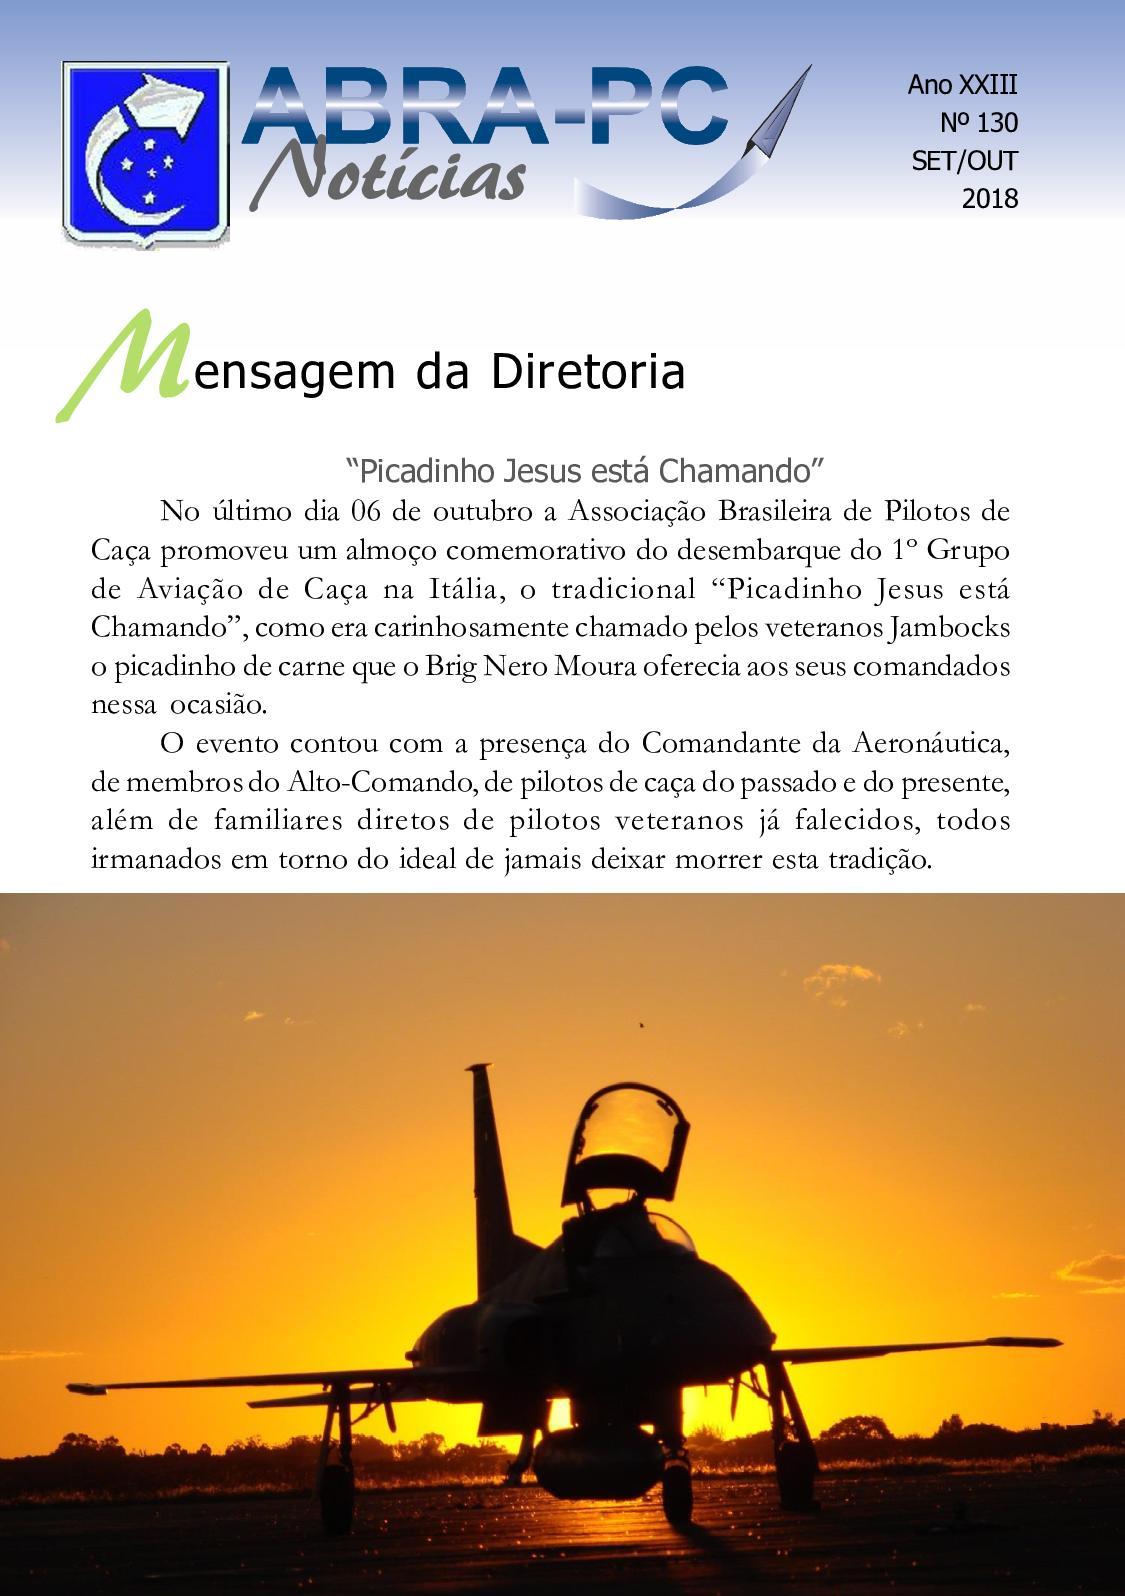 Calaméo - ABRA-PC Notícias 130 a6d6b38a2d